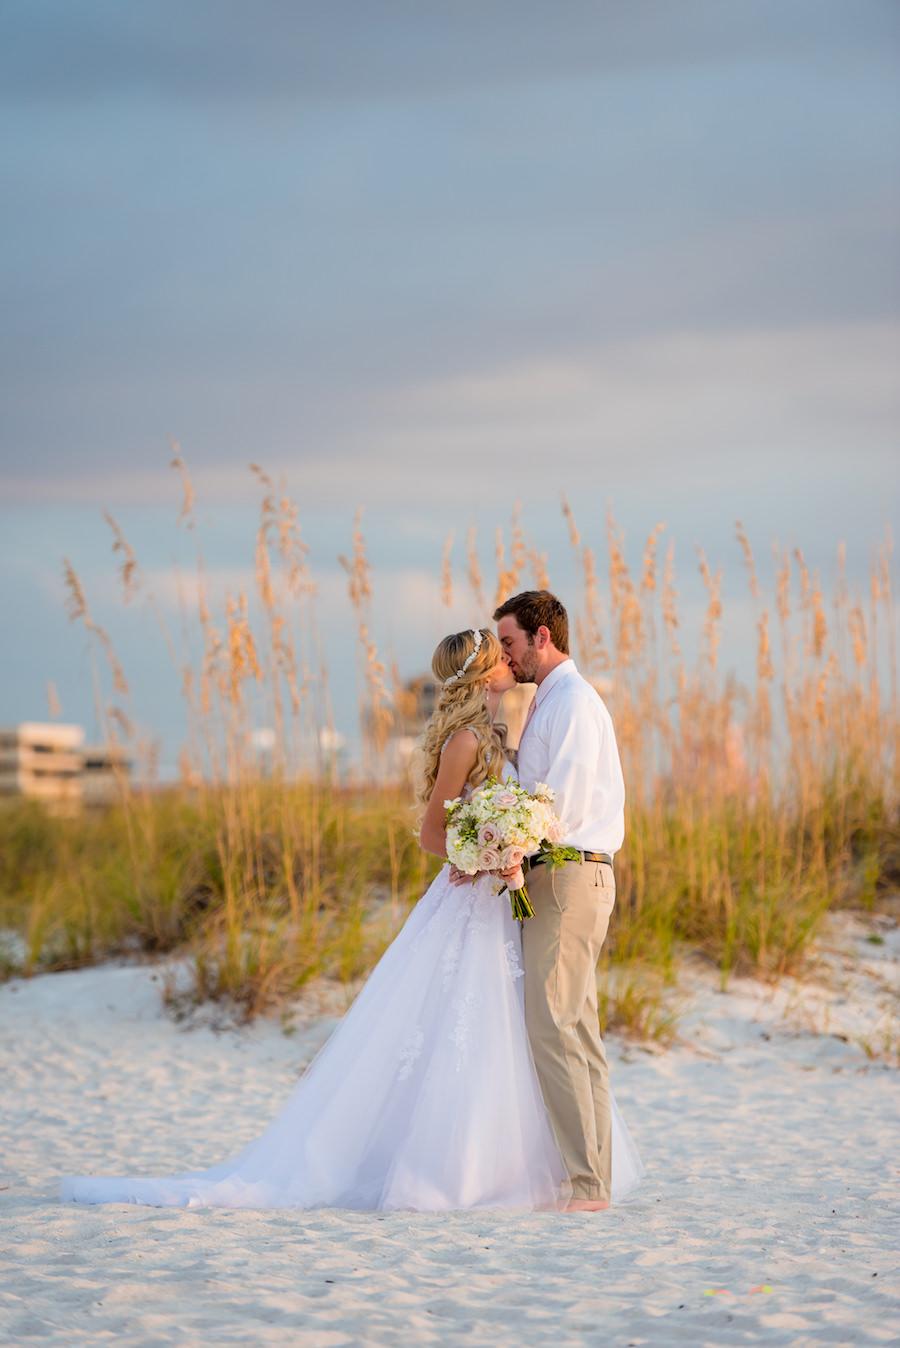 St. Pete Beach Bride and Groom Wedding Portrait | St. Pete Beach Florida Wedding Portrait | Tampa Wedding Photographer Kera Photography